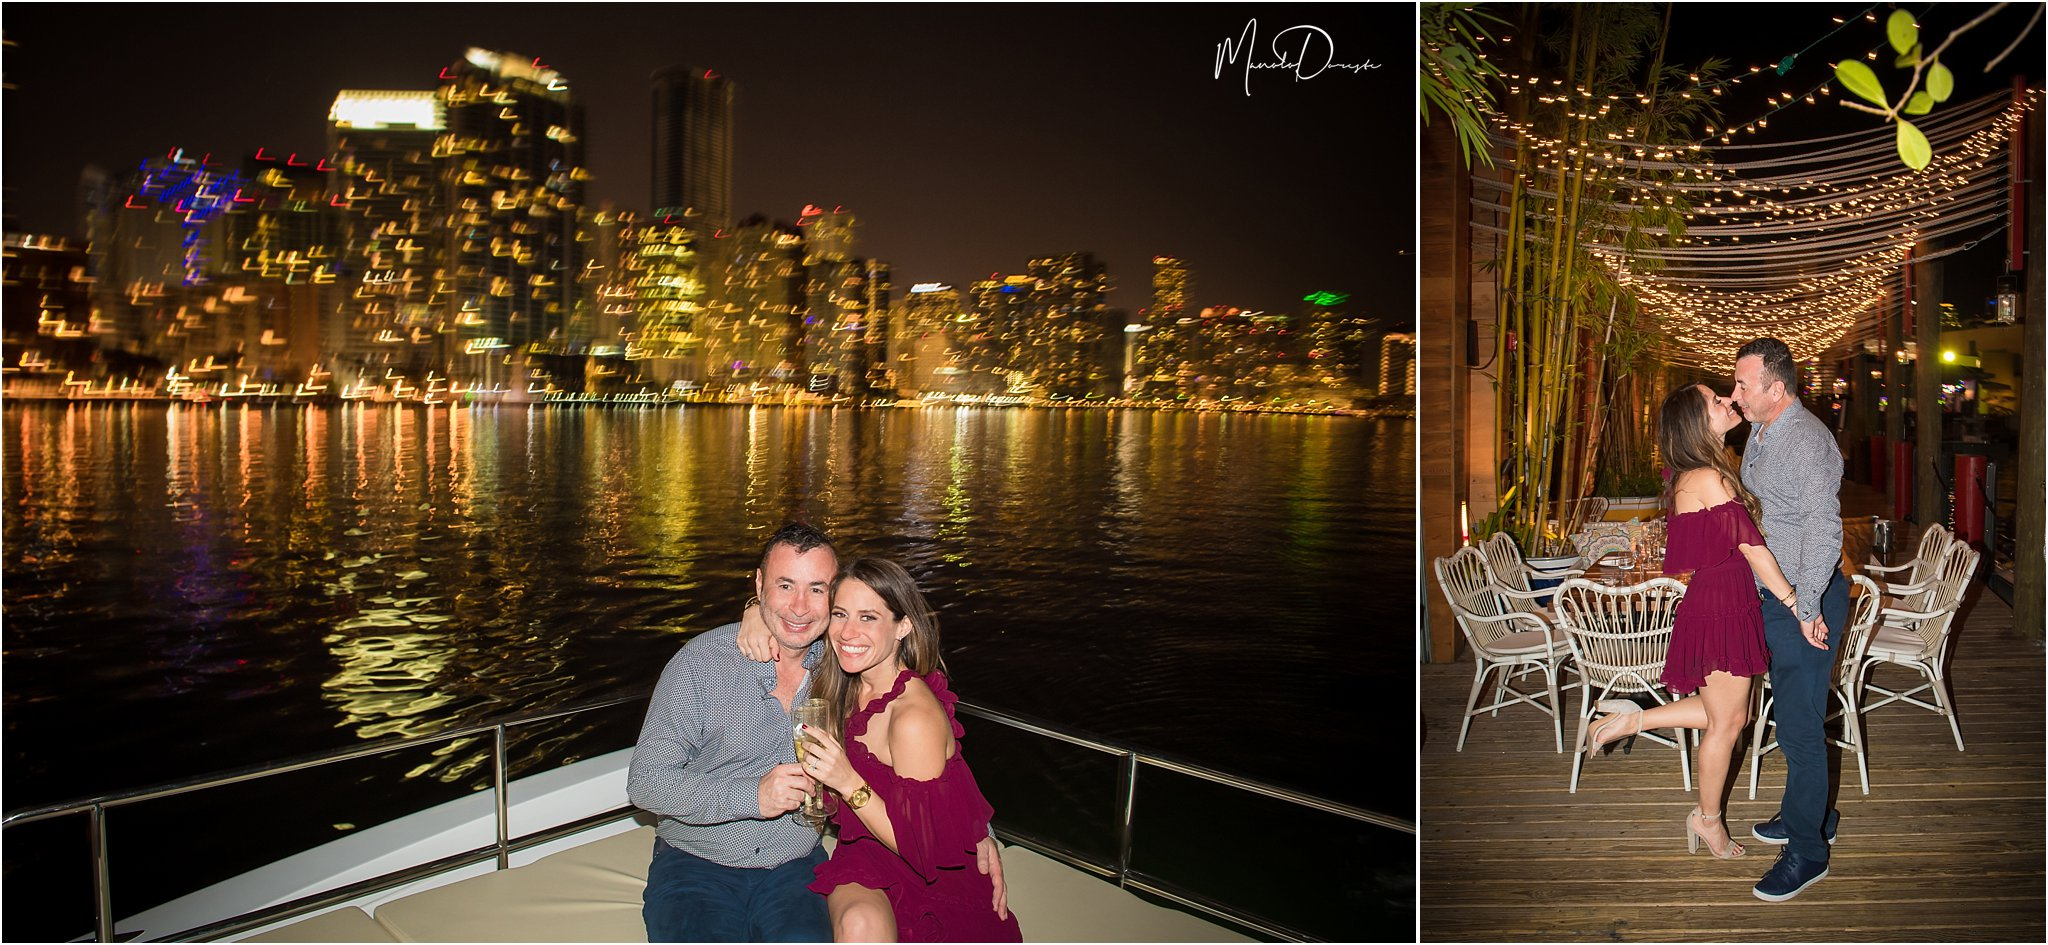 0017_ManoloDoreste_InFocusStudios_Wedding_Family_Photography_Miami_MiamiPhotographer.jpg